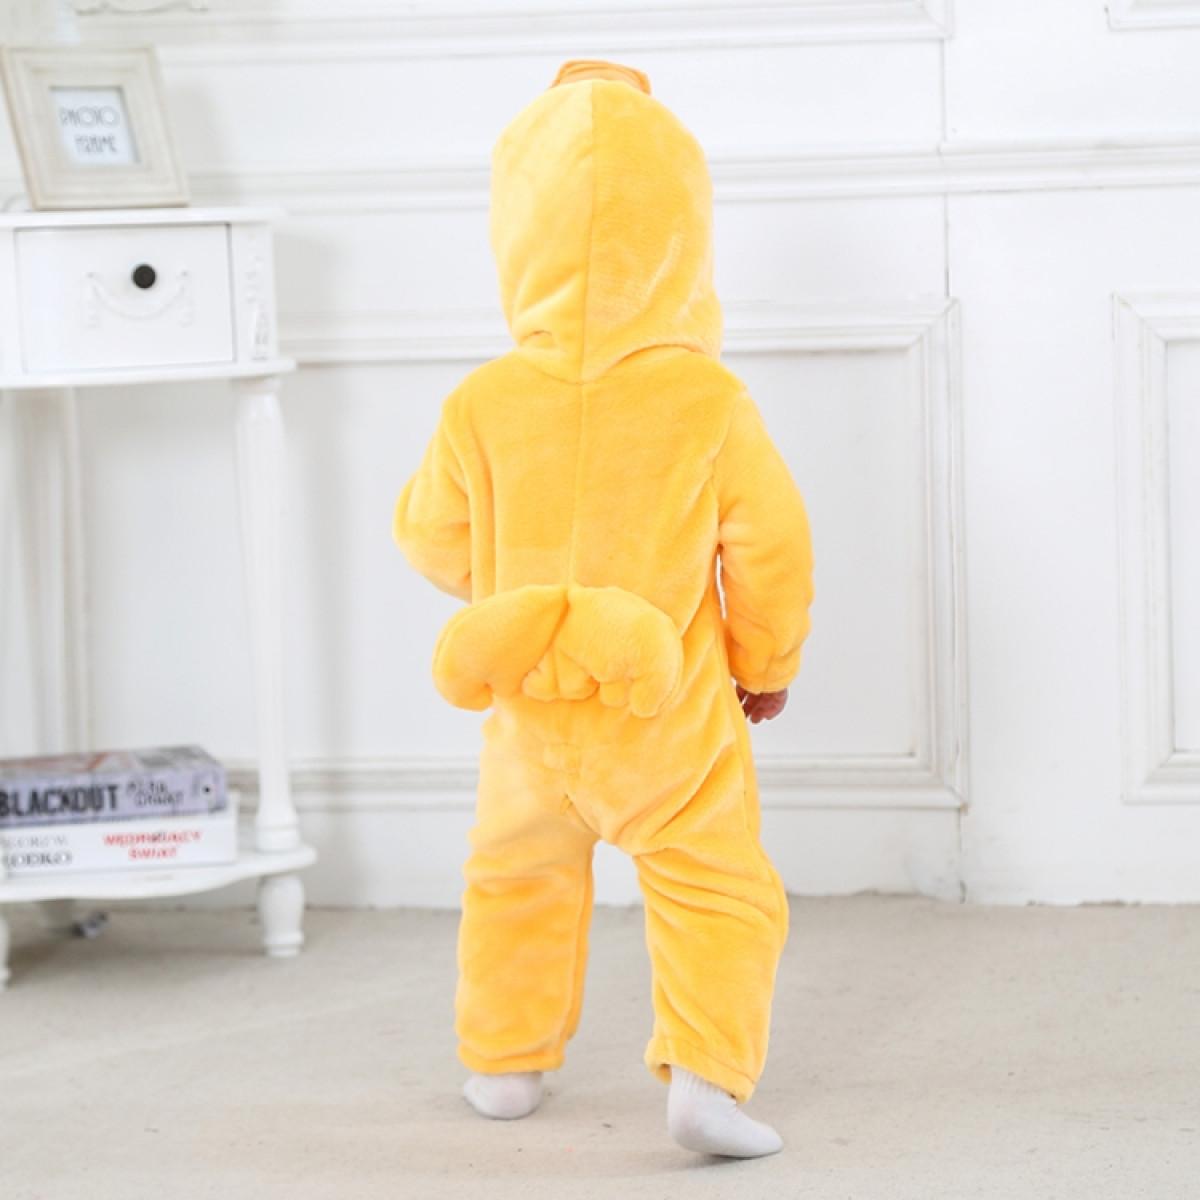 kvaliteten kostum račka 74503